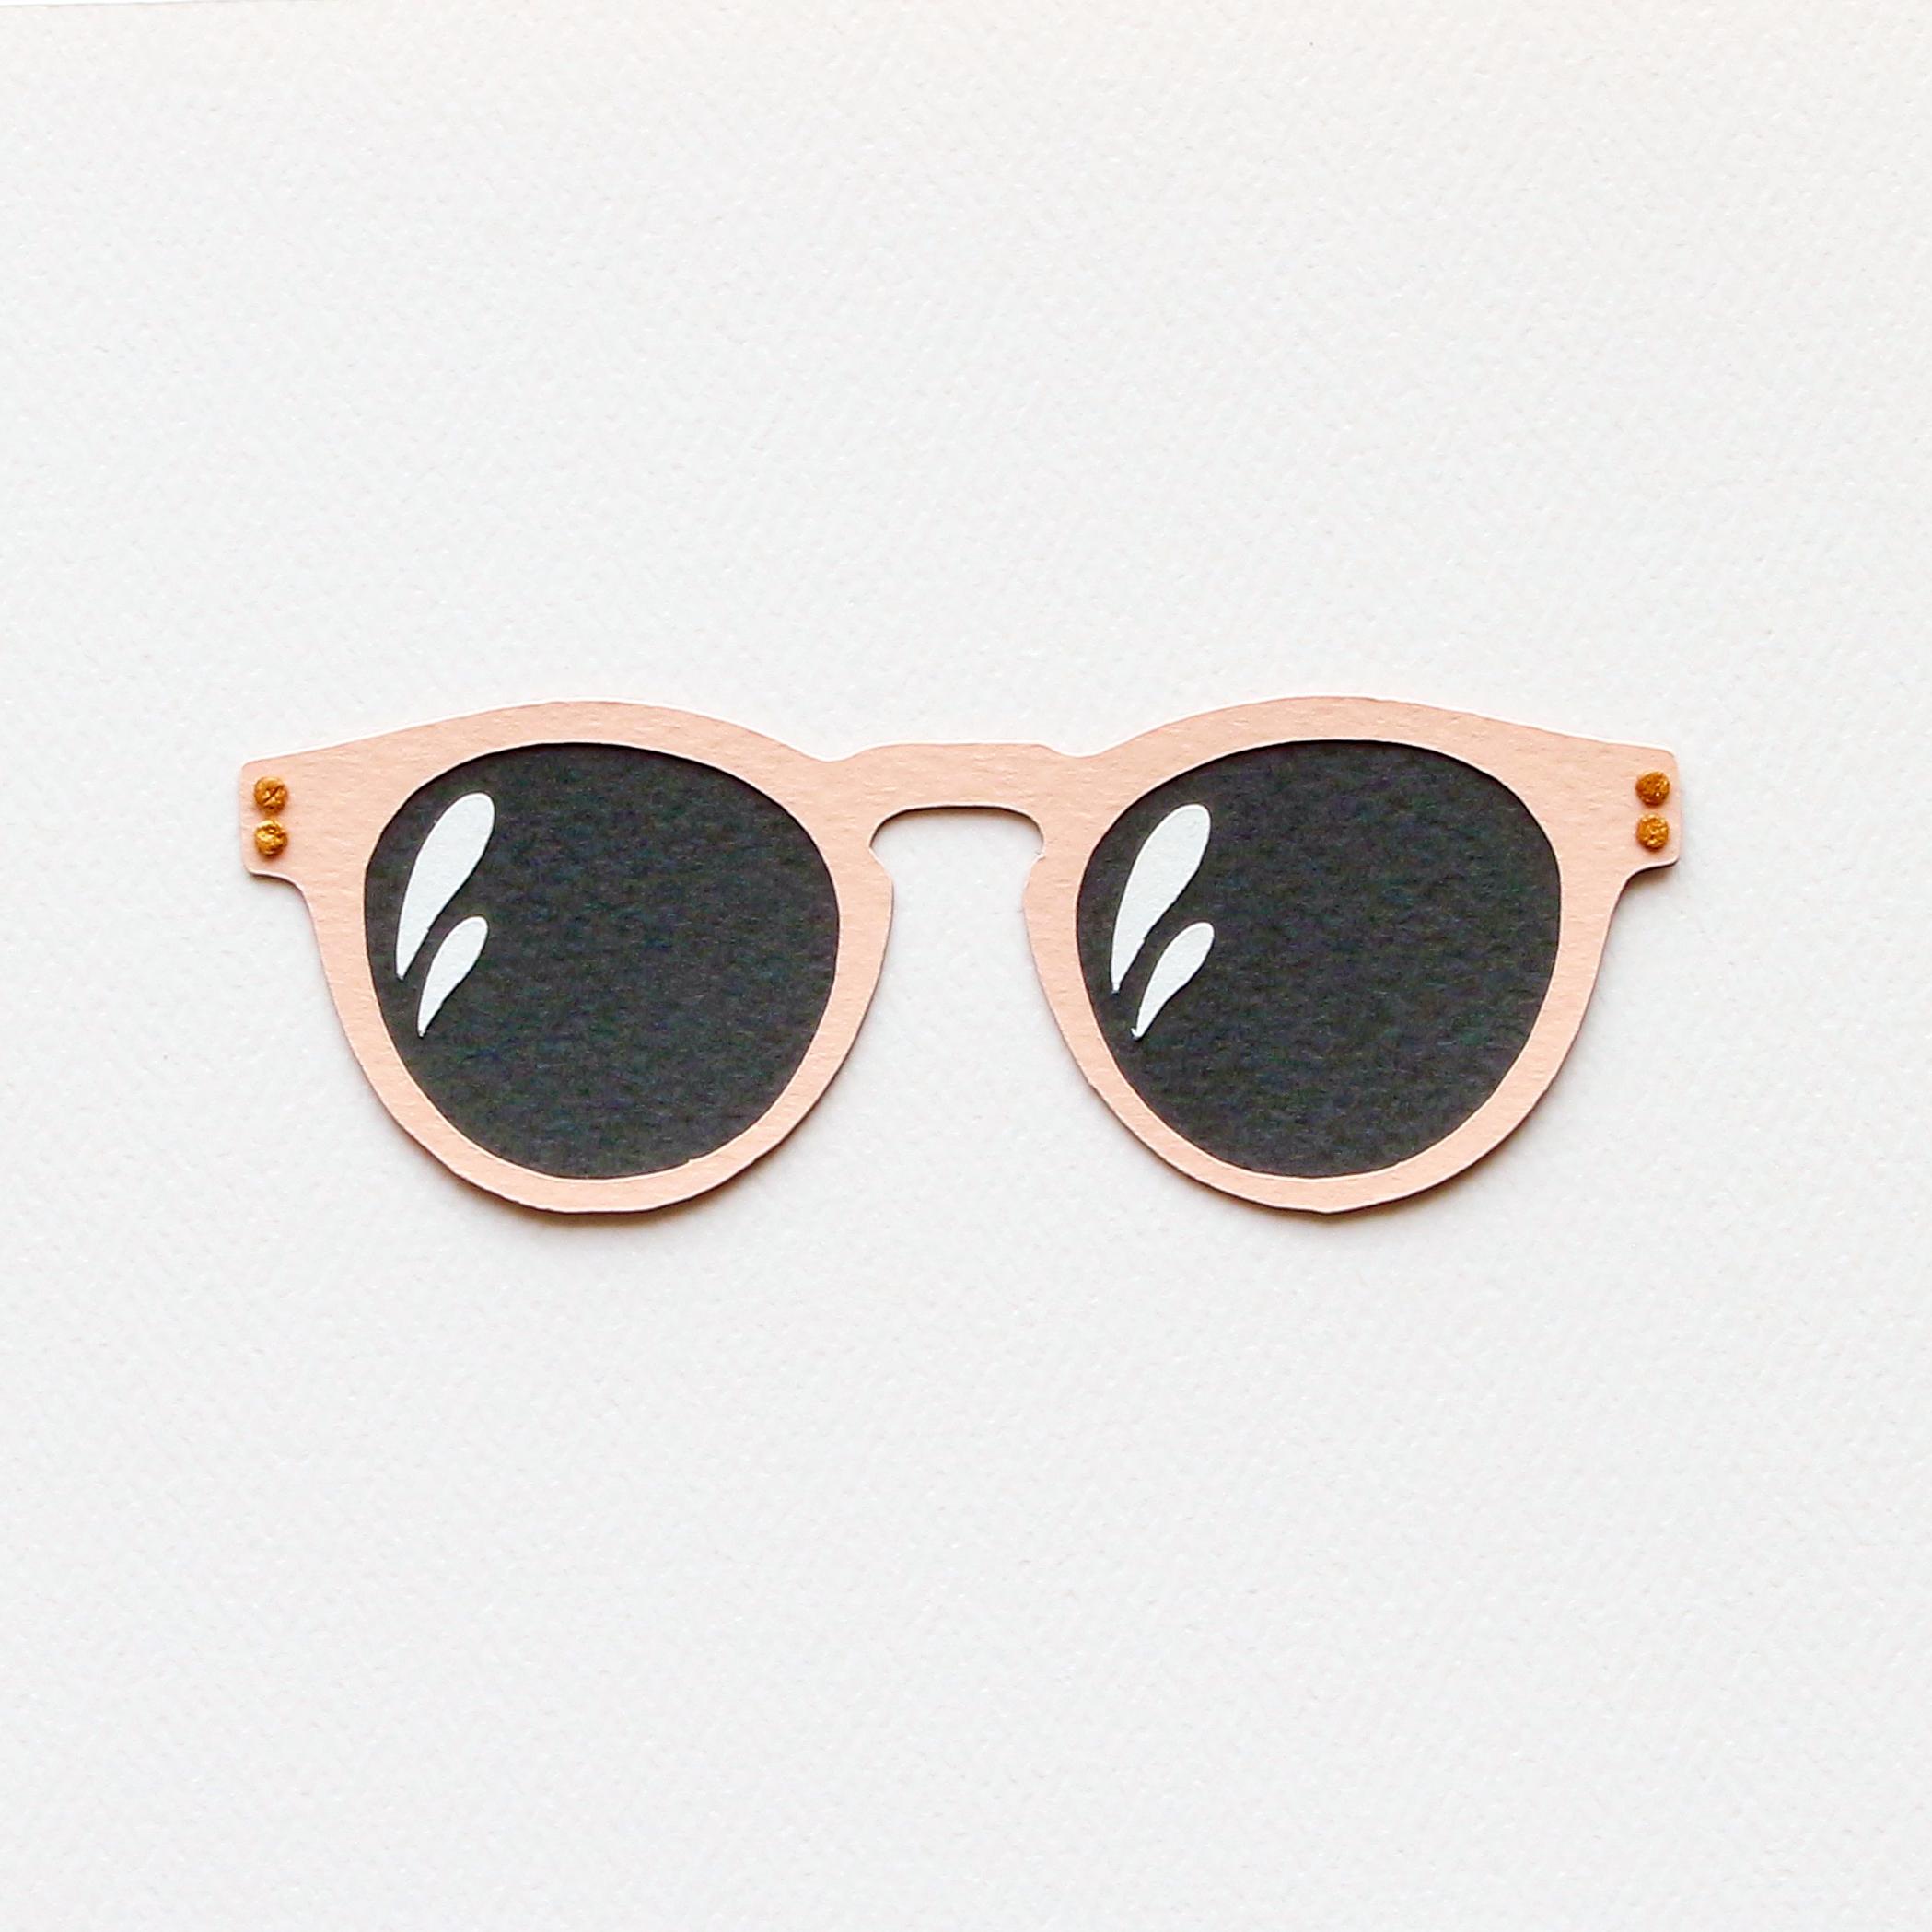 j crew sunglasses illustration brittani rose paper.jpg